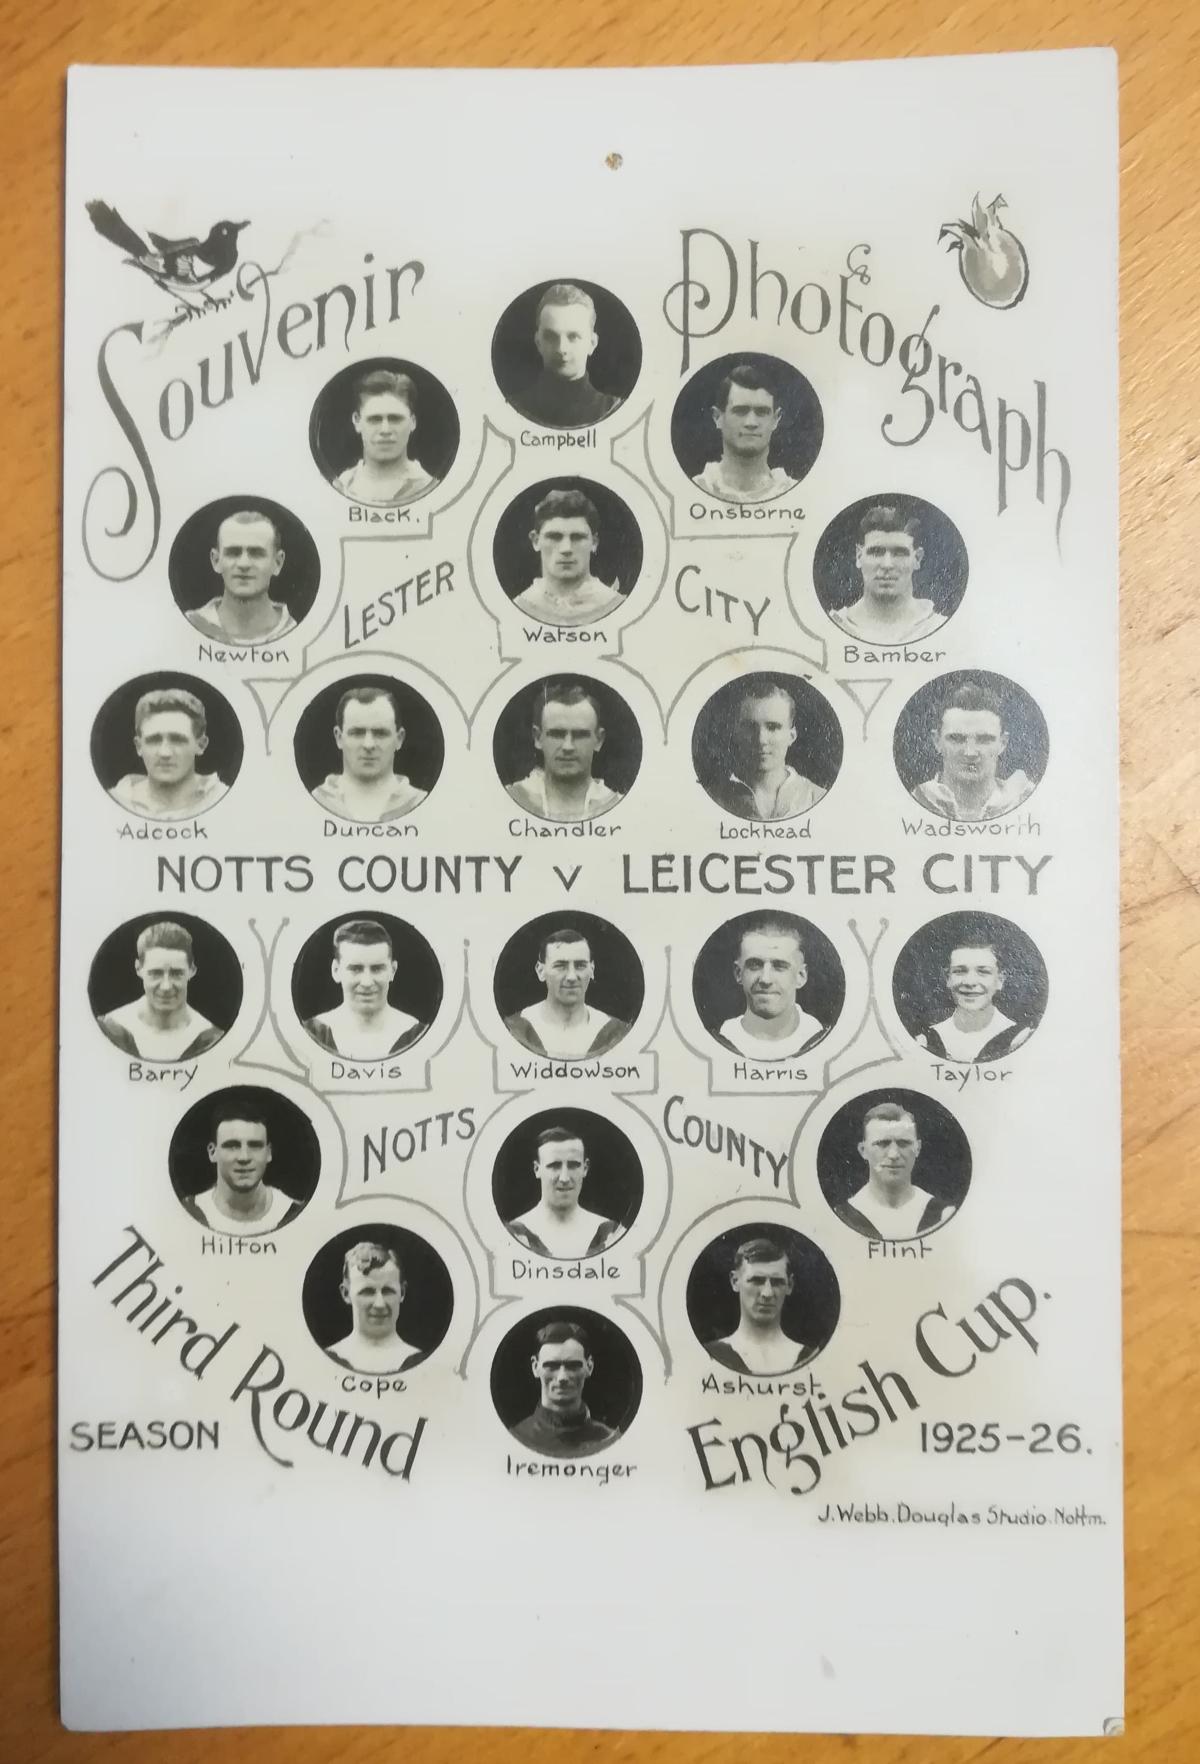 FA cup memorabilia collector